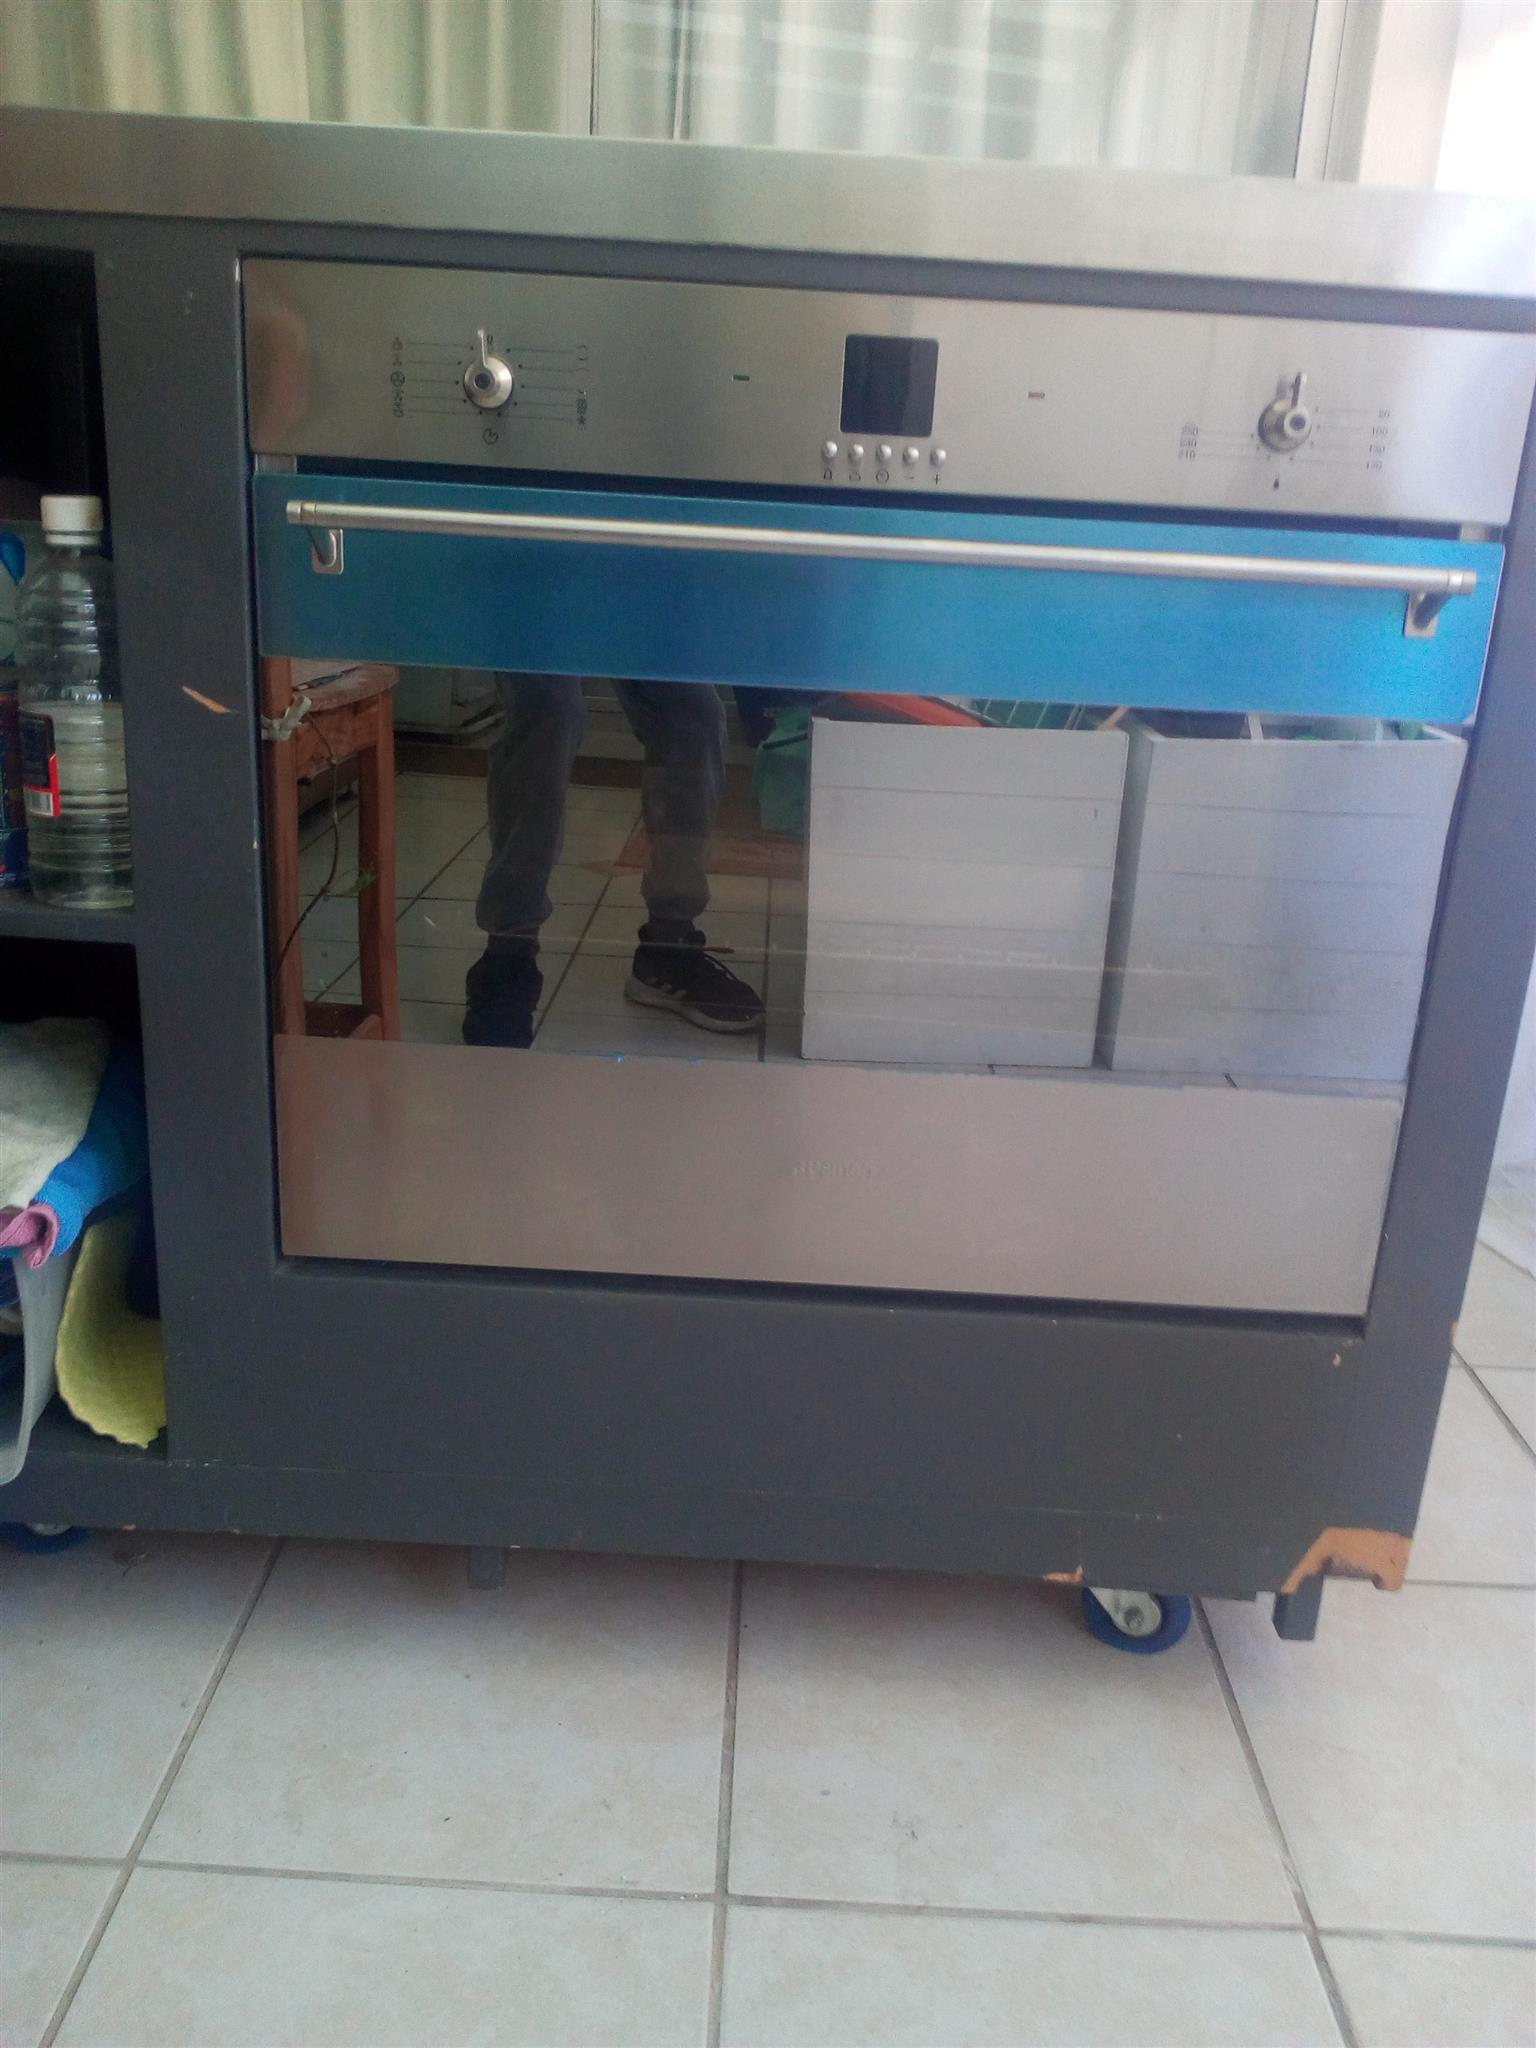 Smeg stainless steel oven